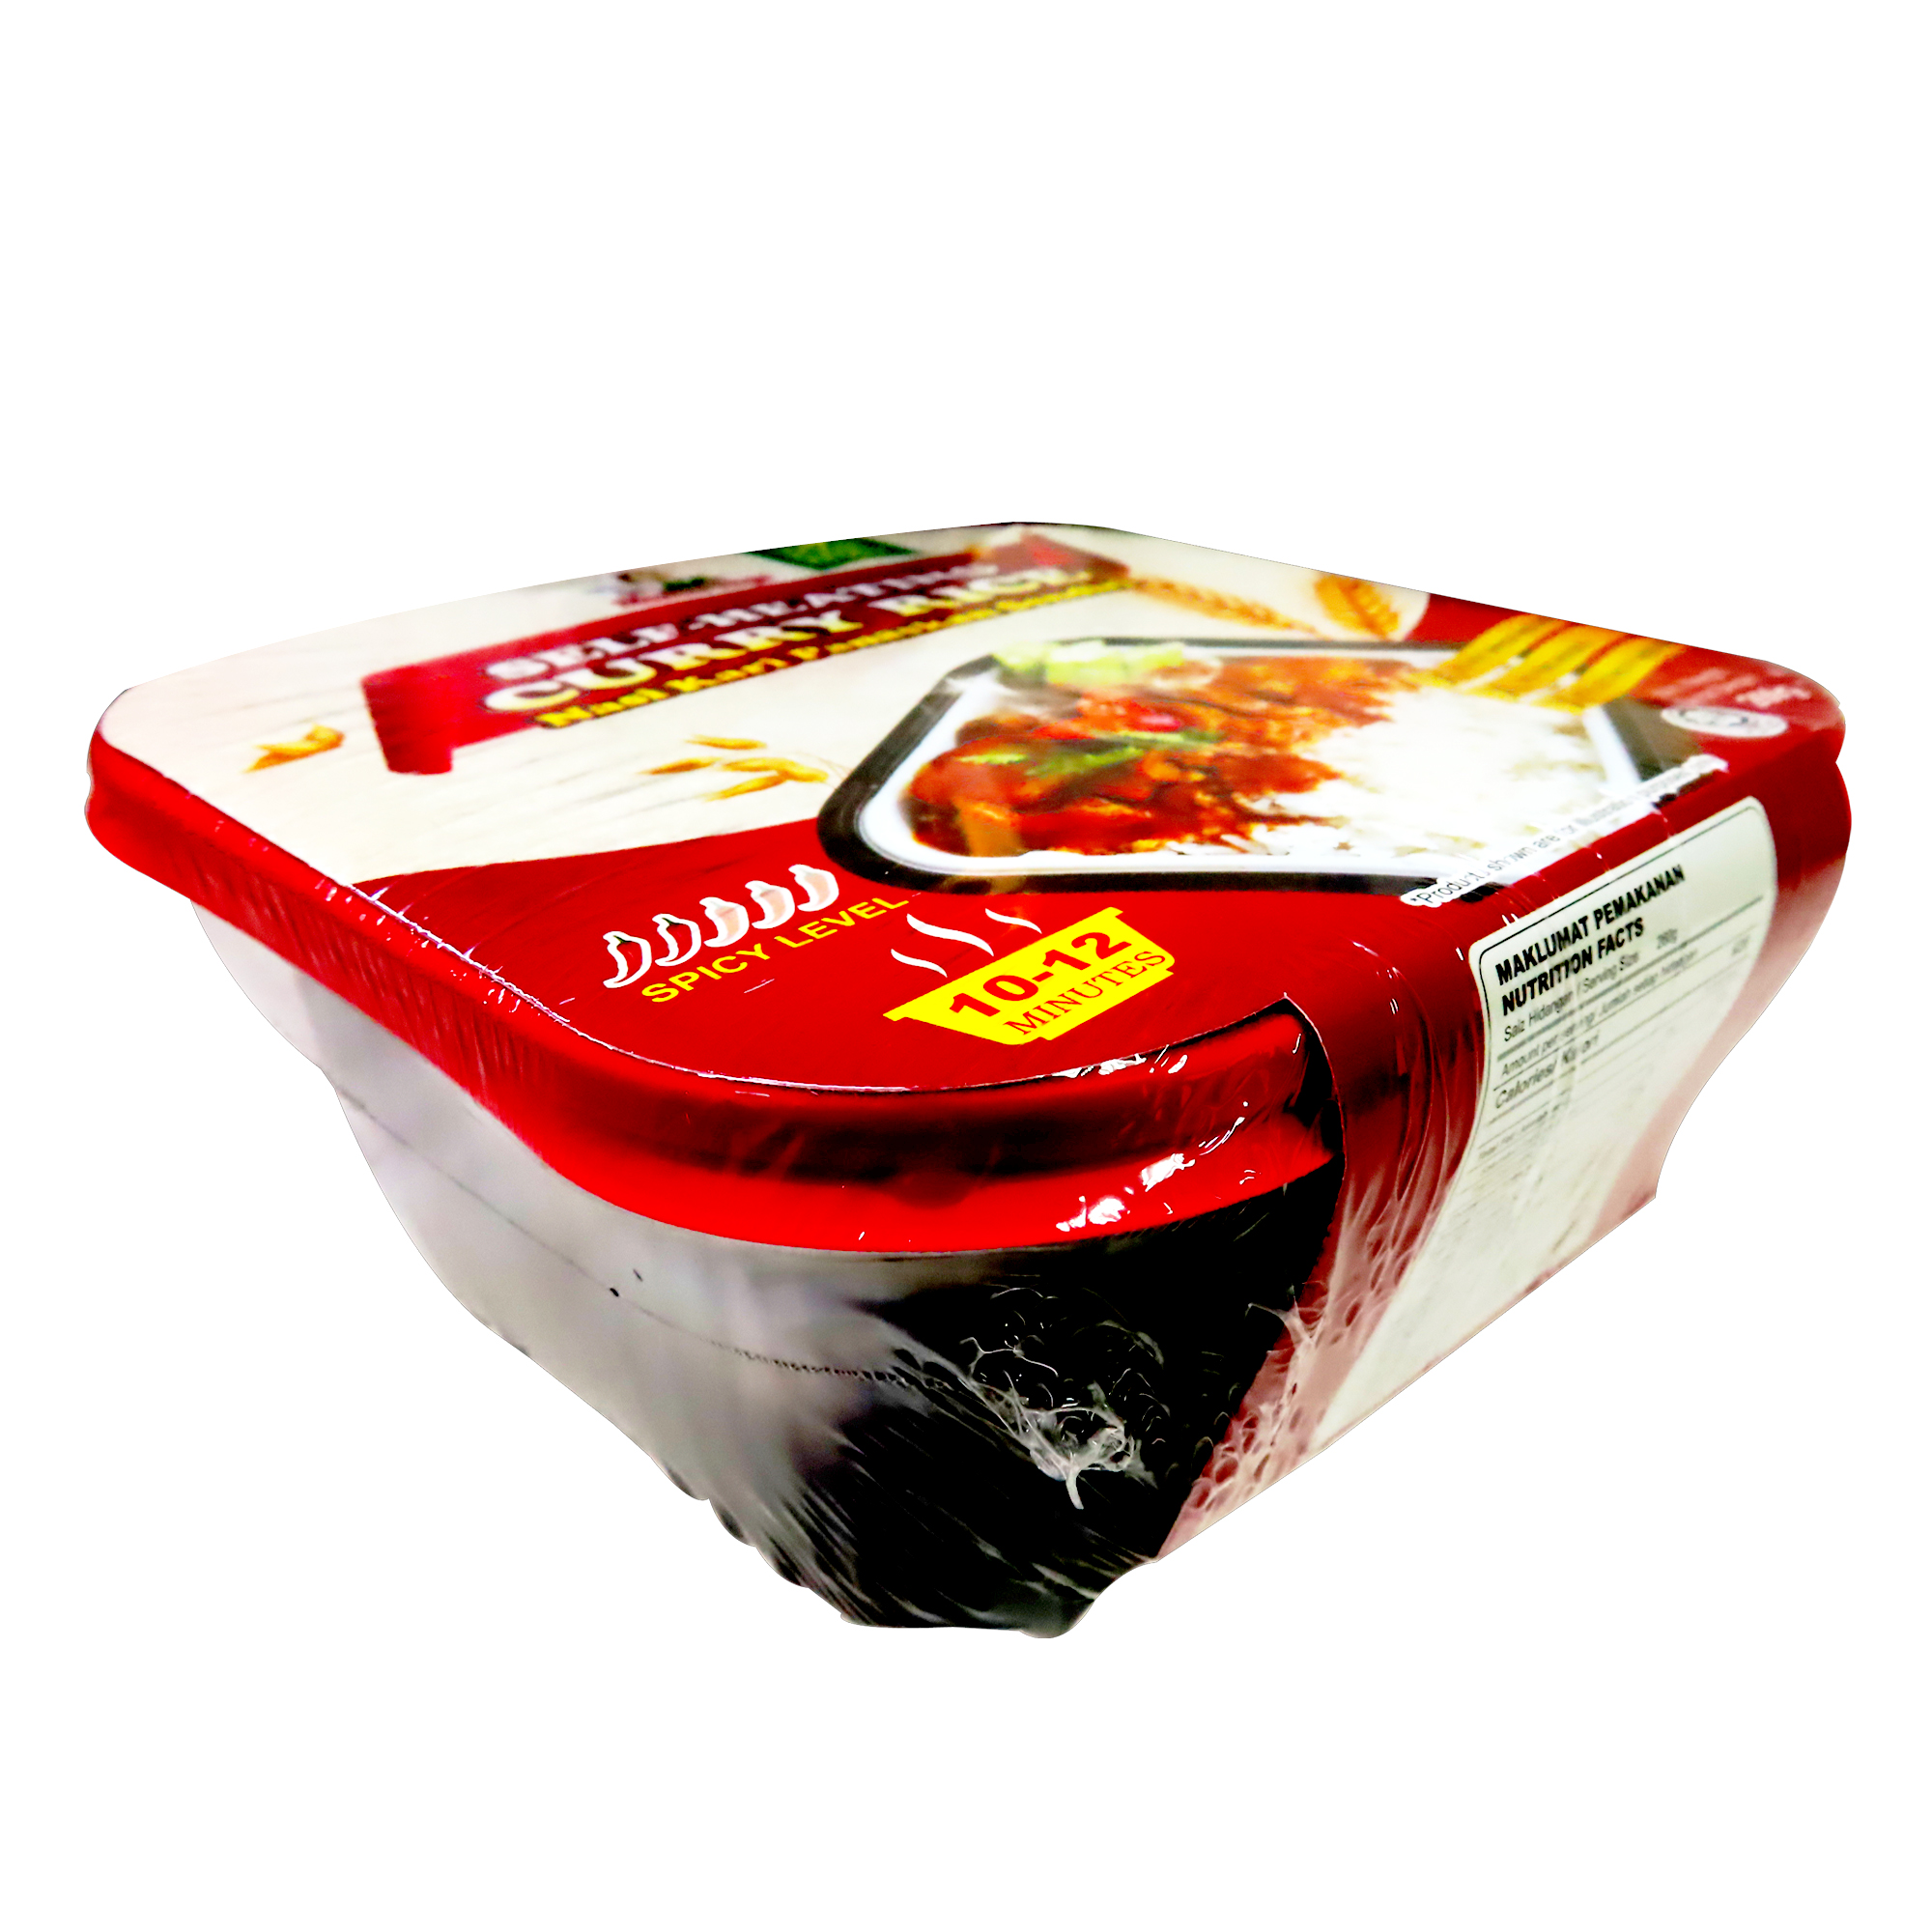 Image MMV Self Heating Curry Rice 自热懒人咖哩饭 260grams